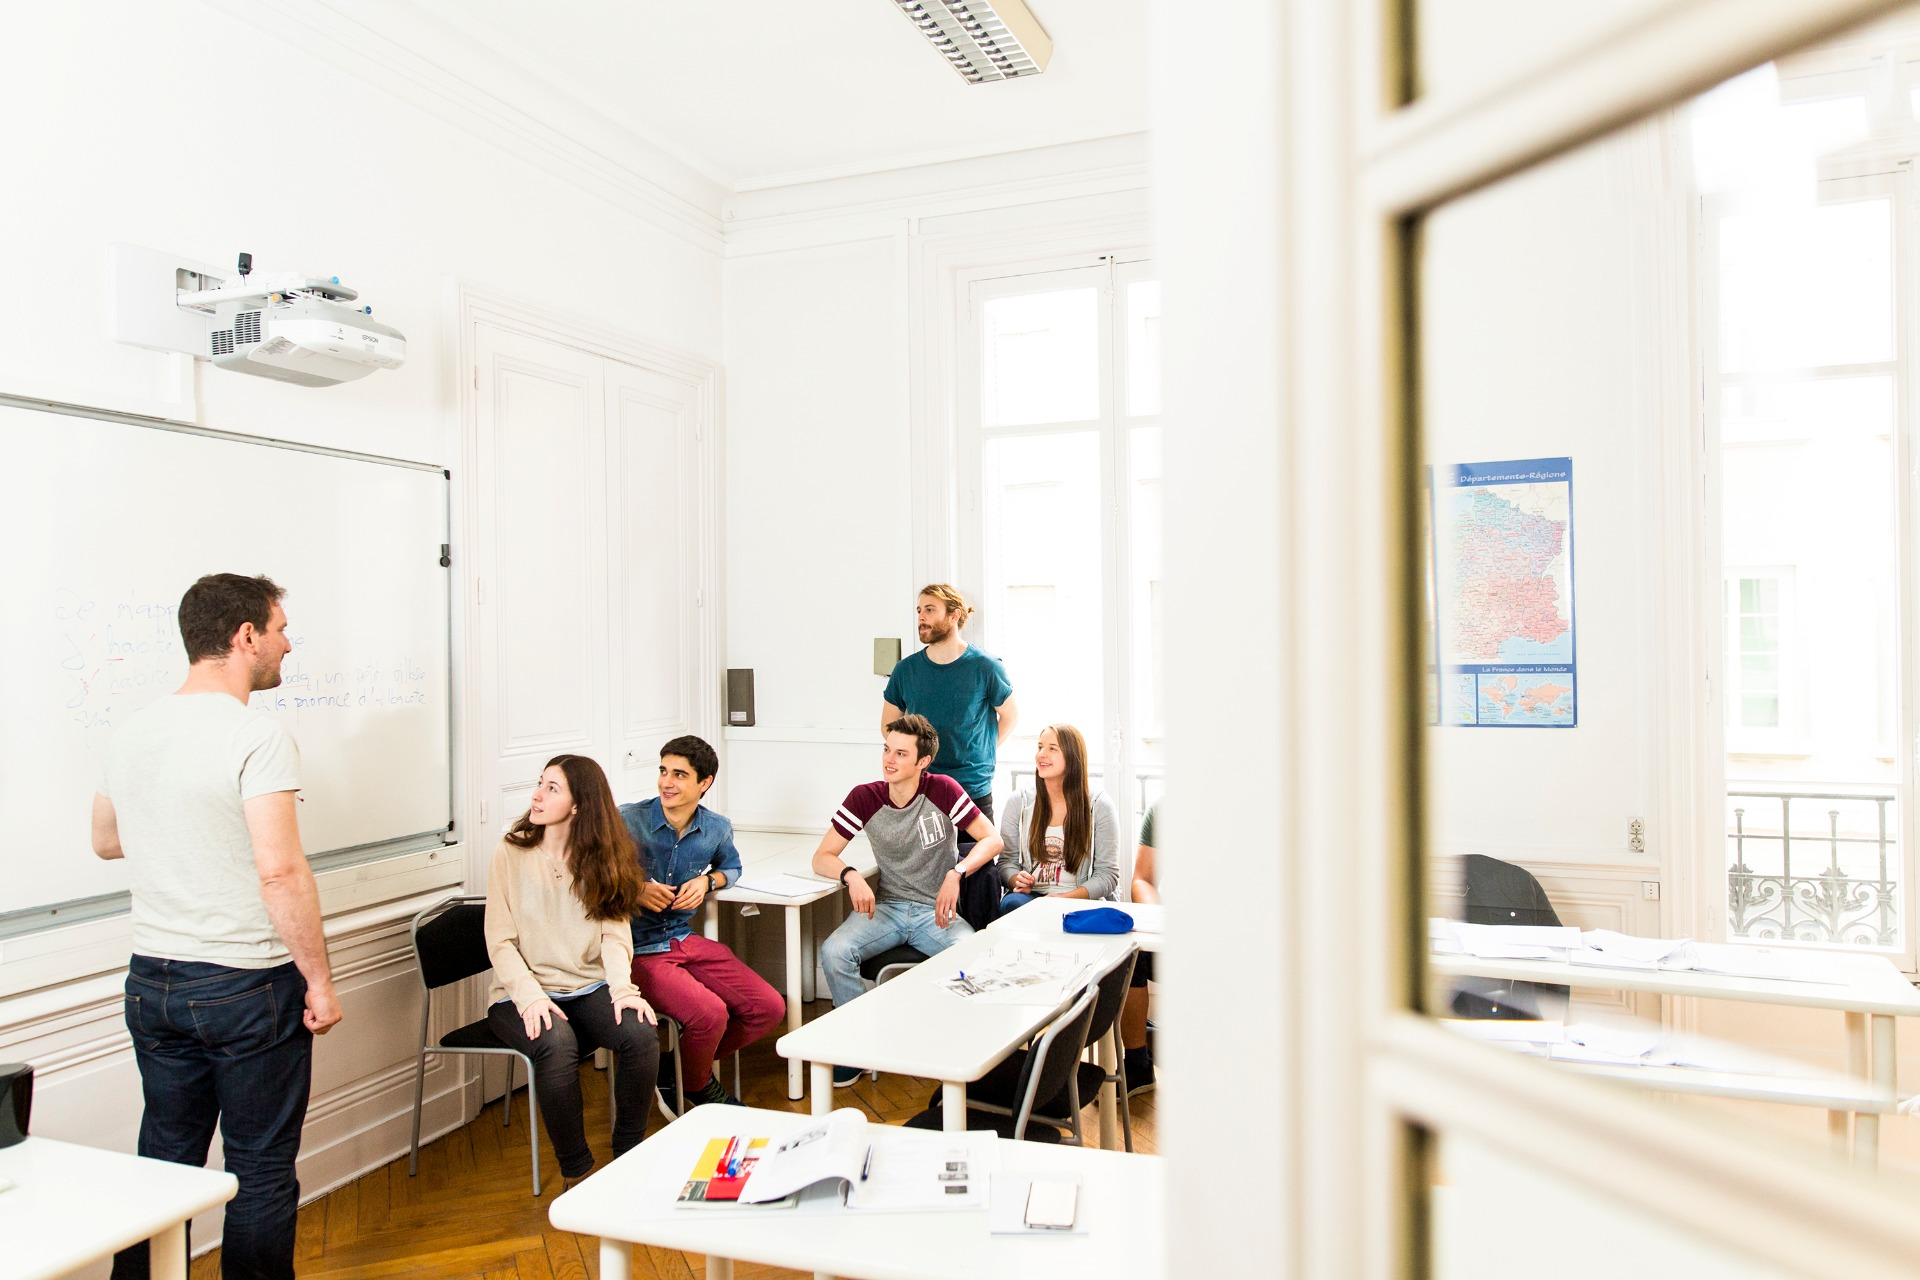 French language class